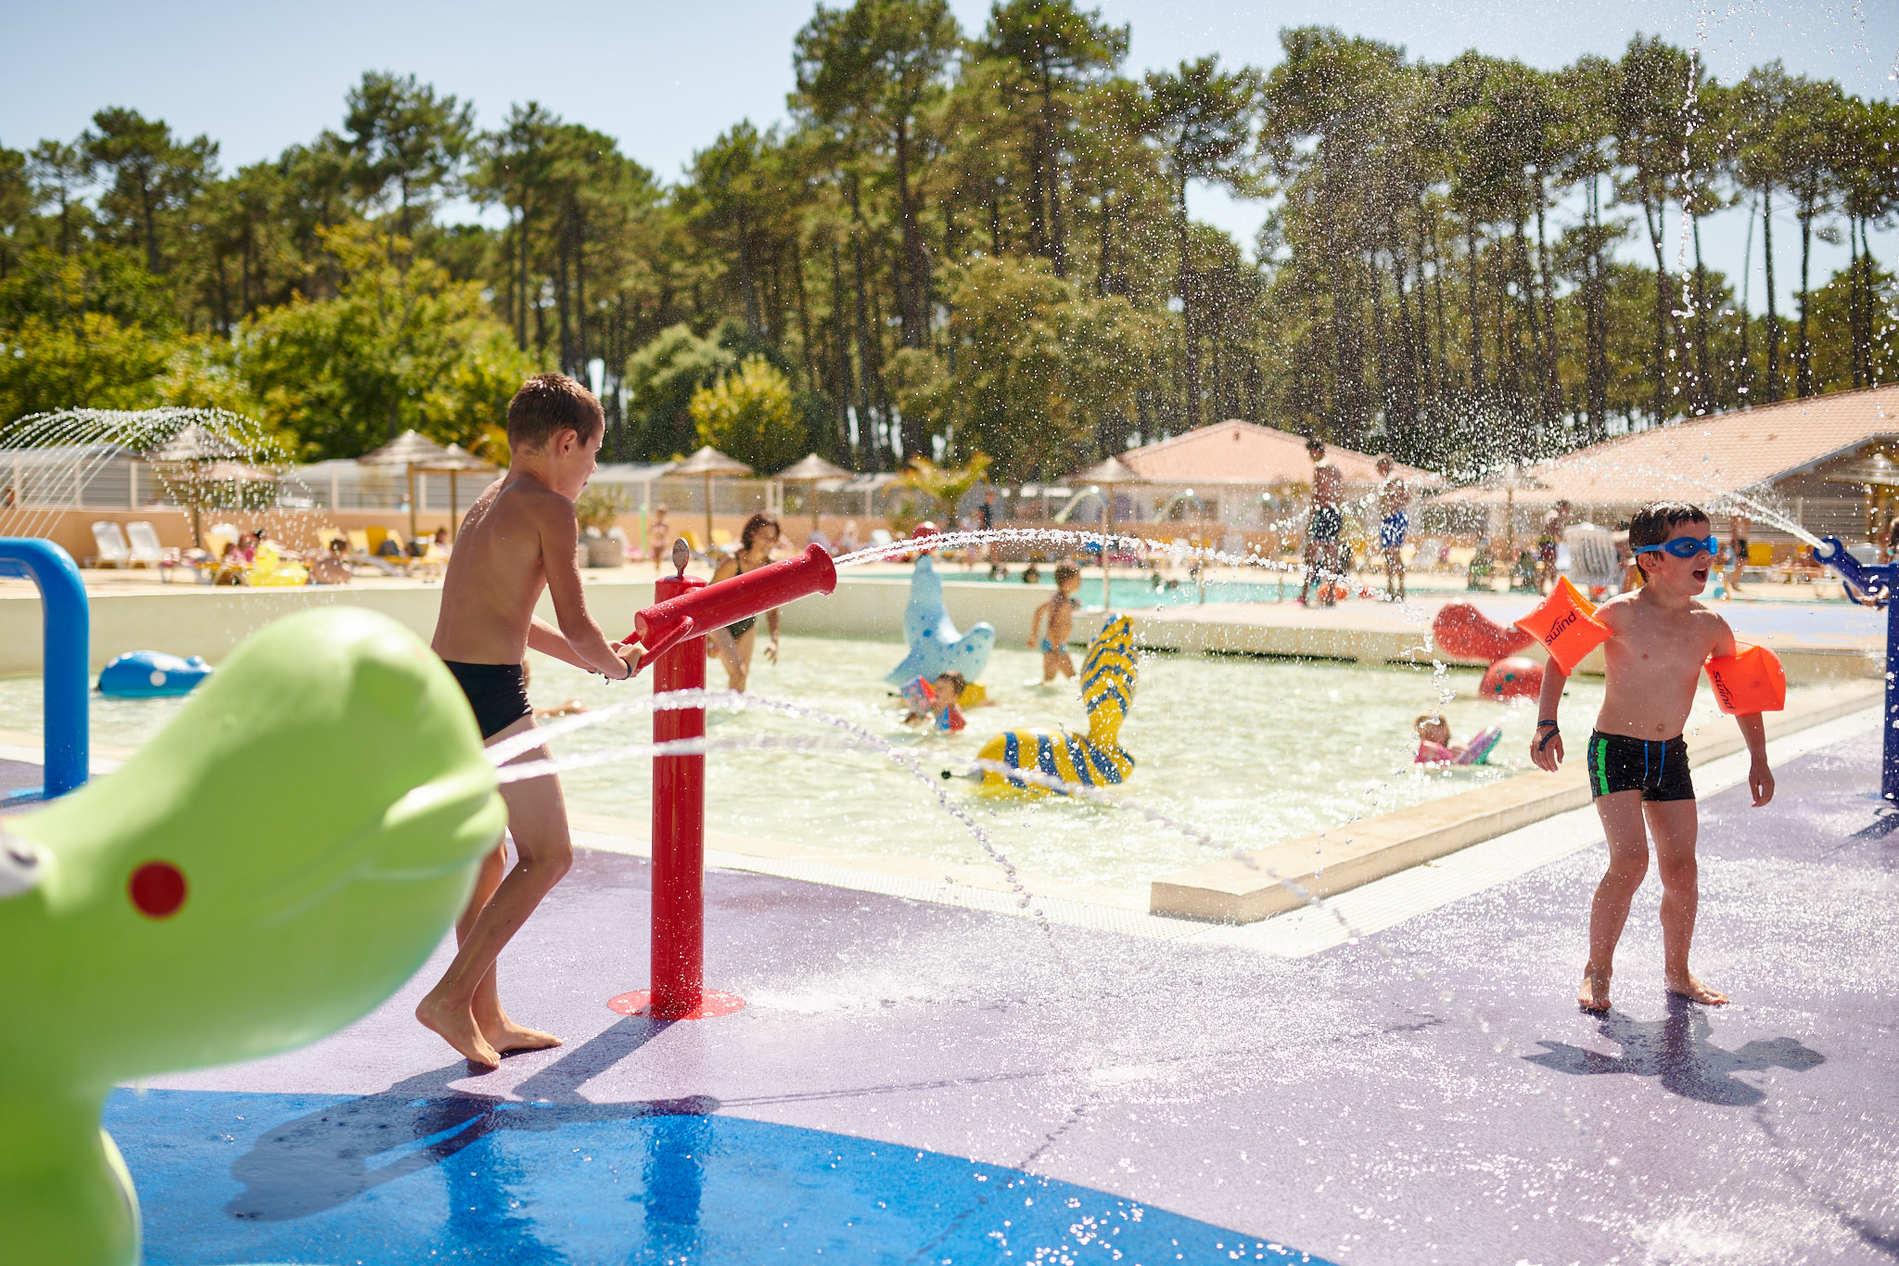 Frankrijk-SeignosselePenon-Camping%20Sunelia%20les%20Oyats-ExtraLarge Campings Frankrijk